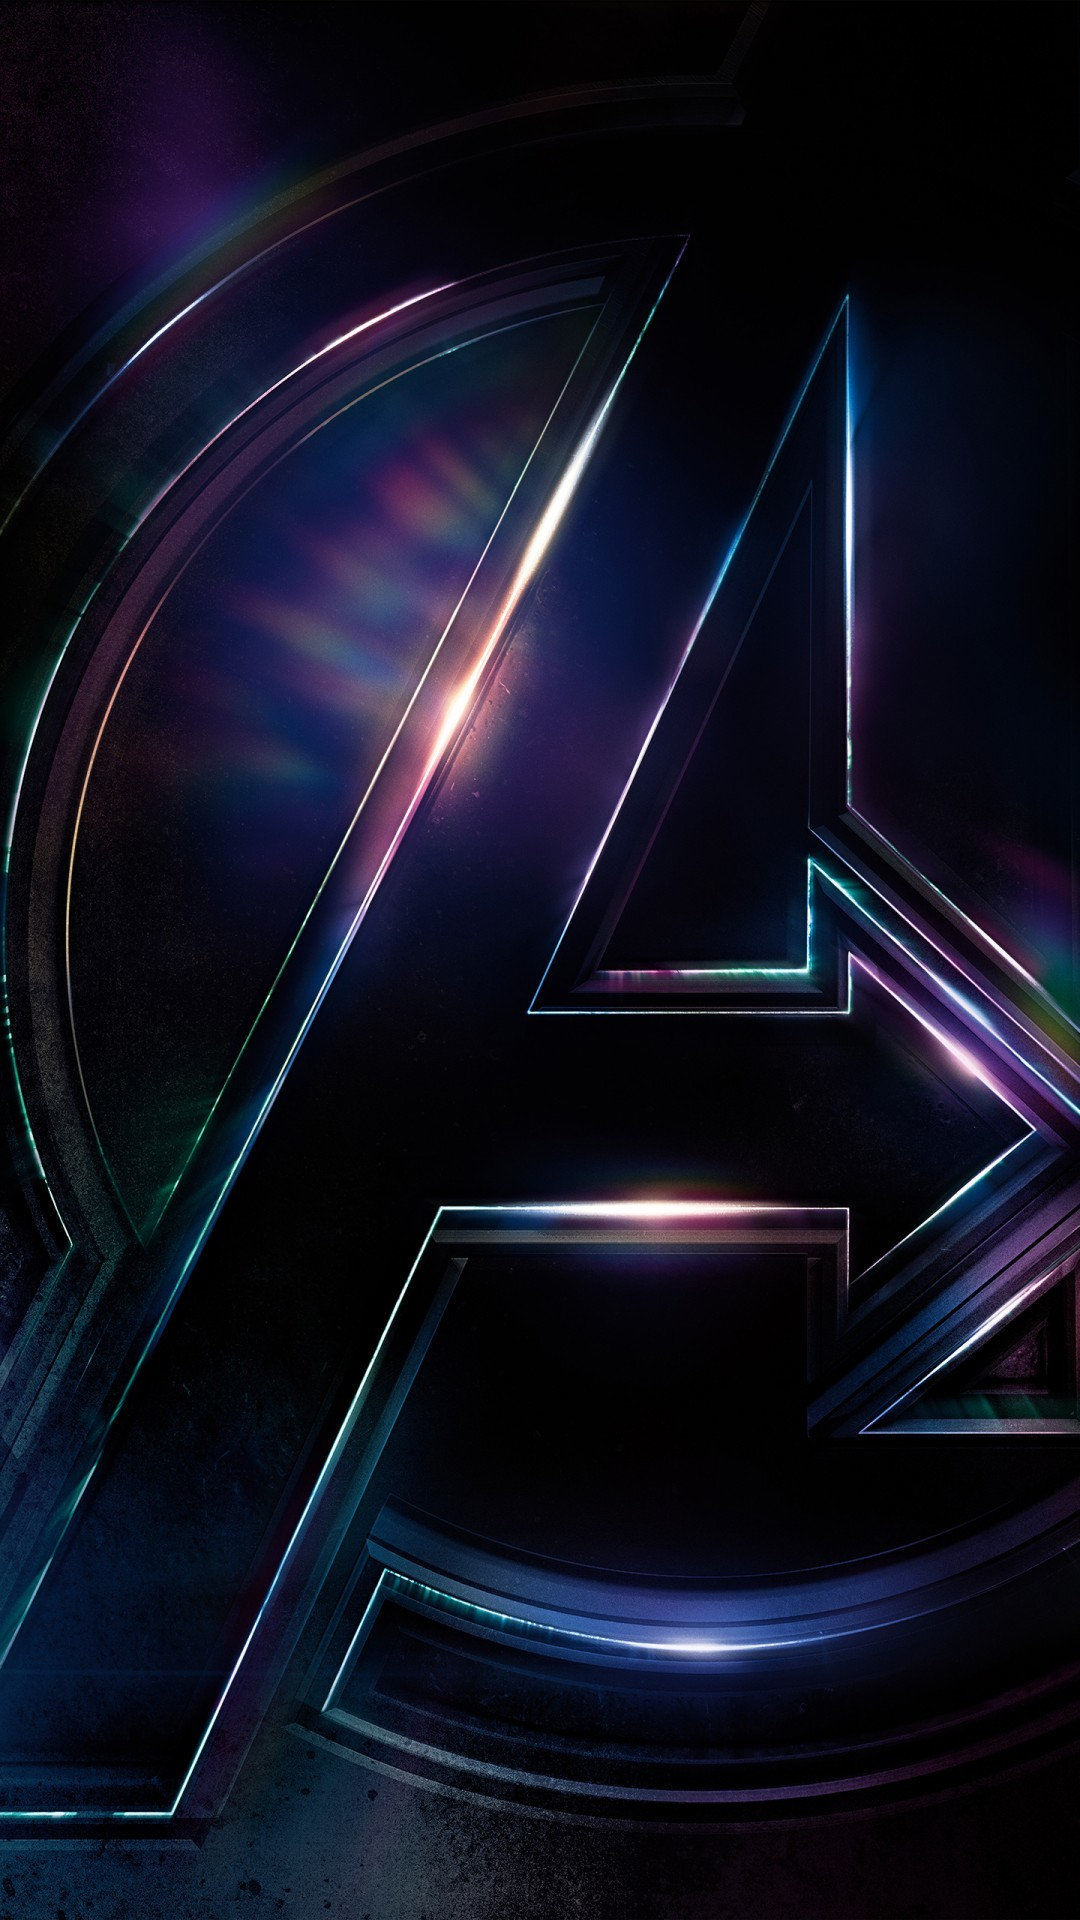 Free Avengers Infinity War Logo phone wallpaper by snoopy41